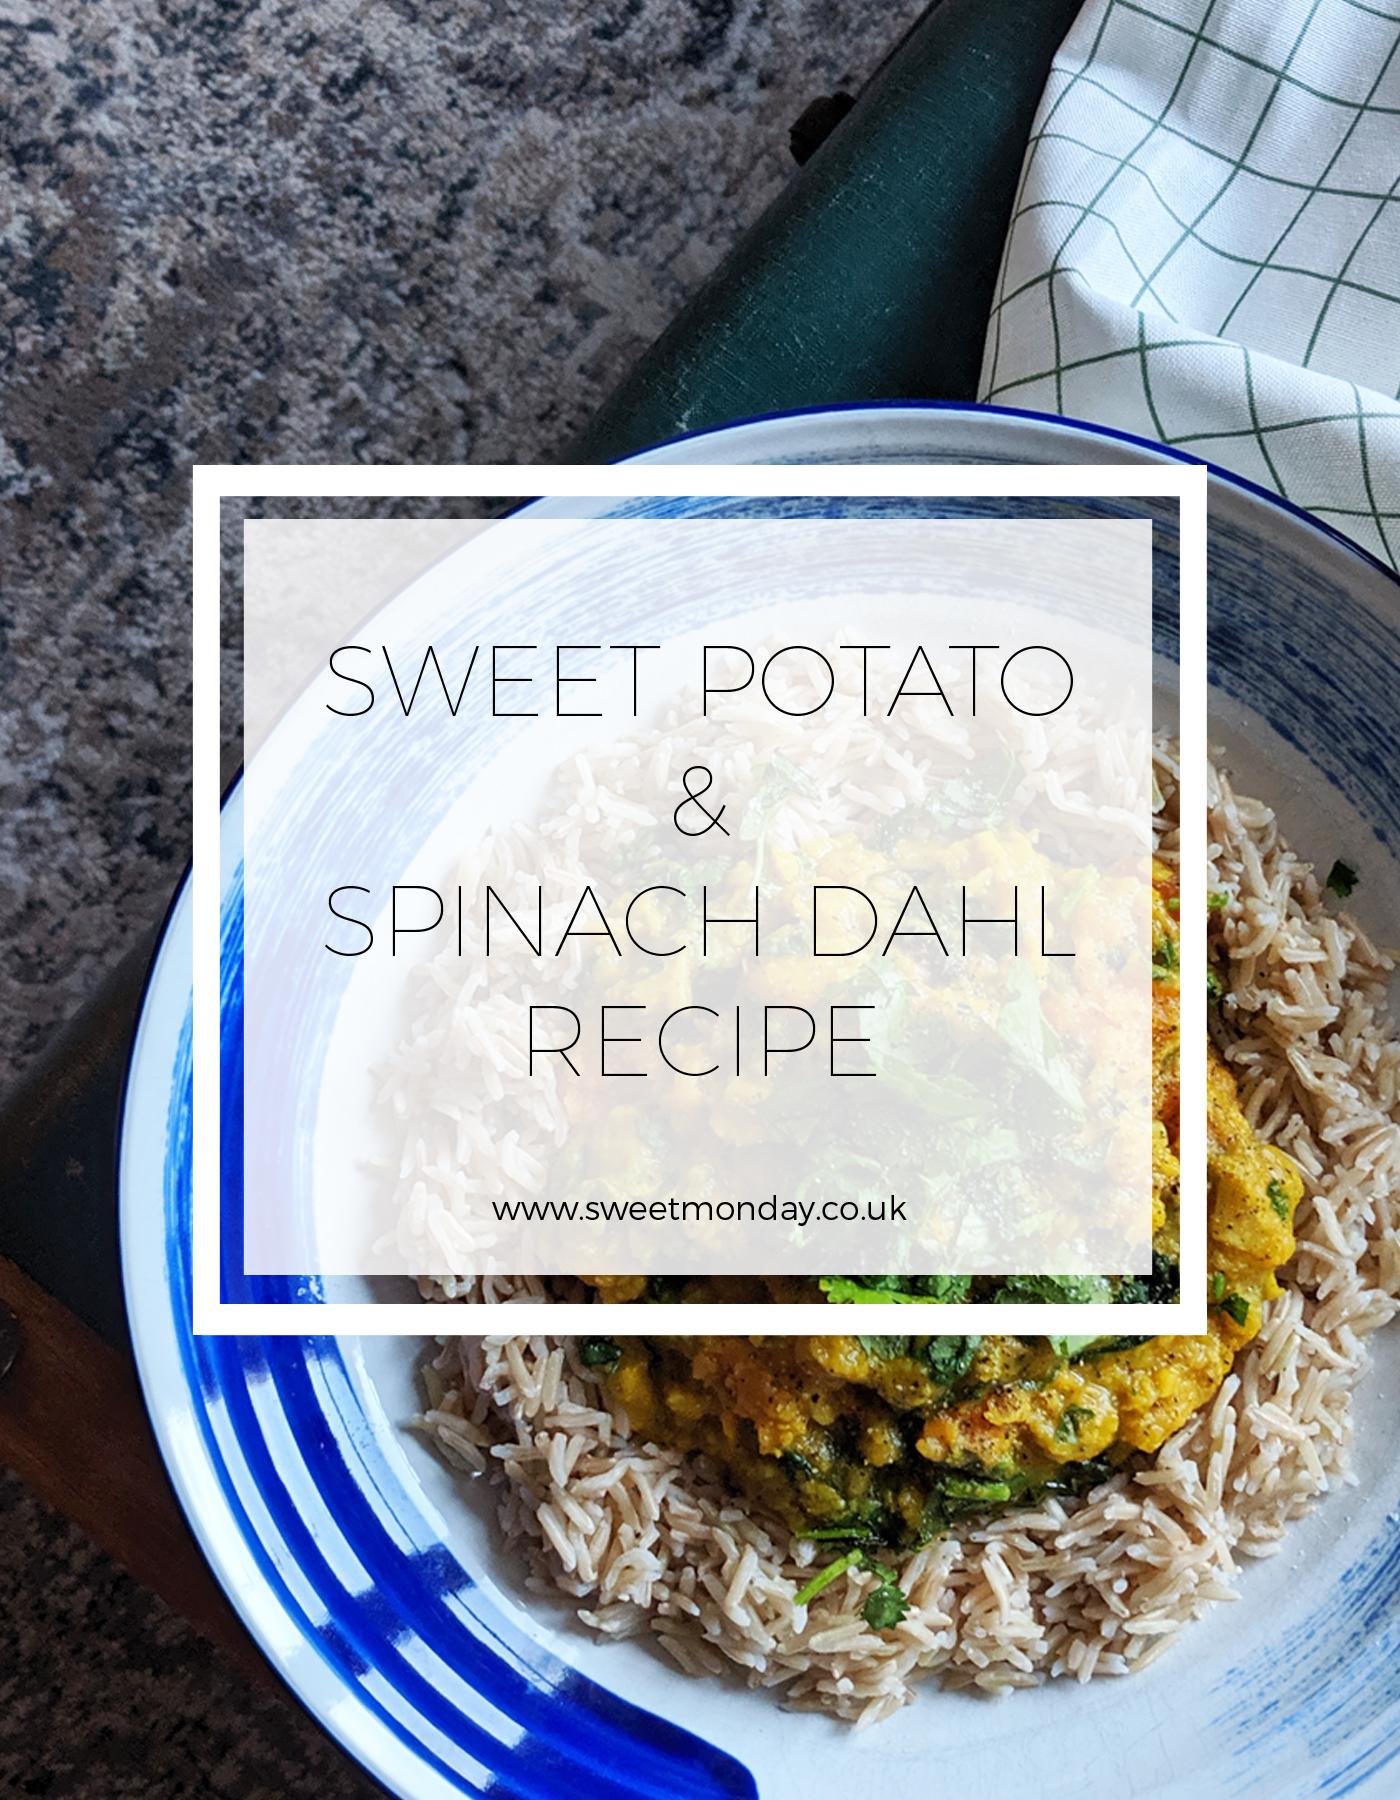 Sweet Potato & Spinach Dahl recipe